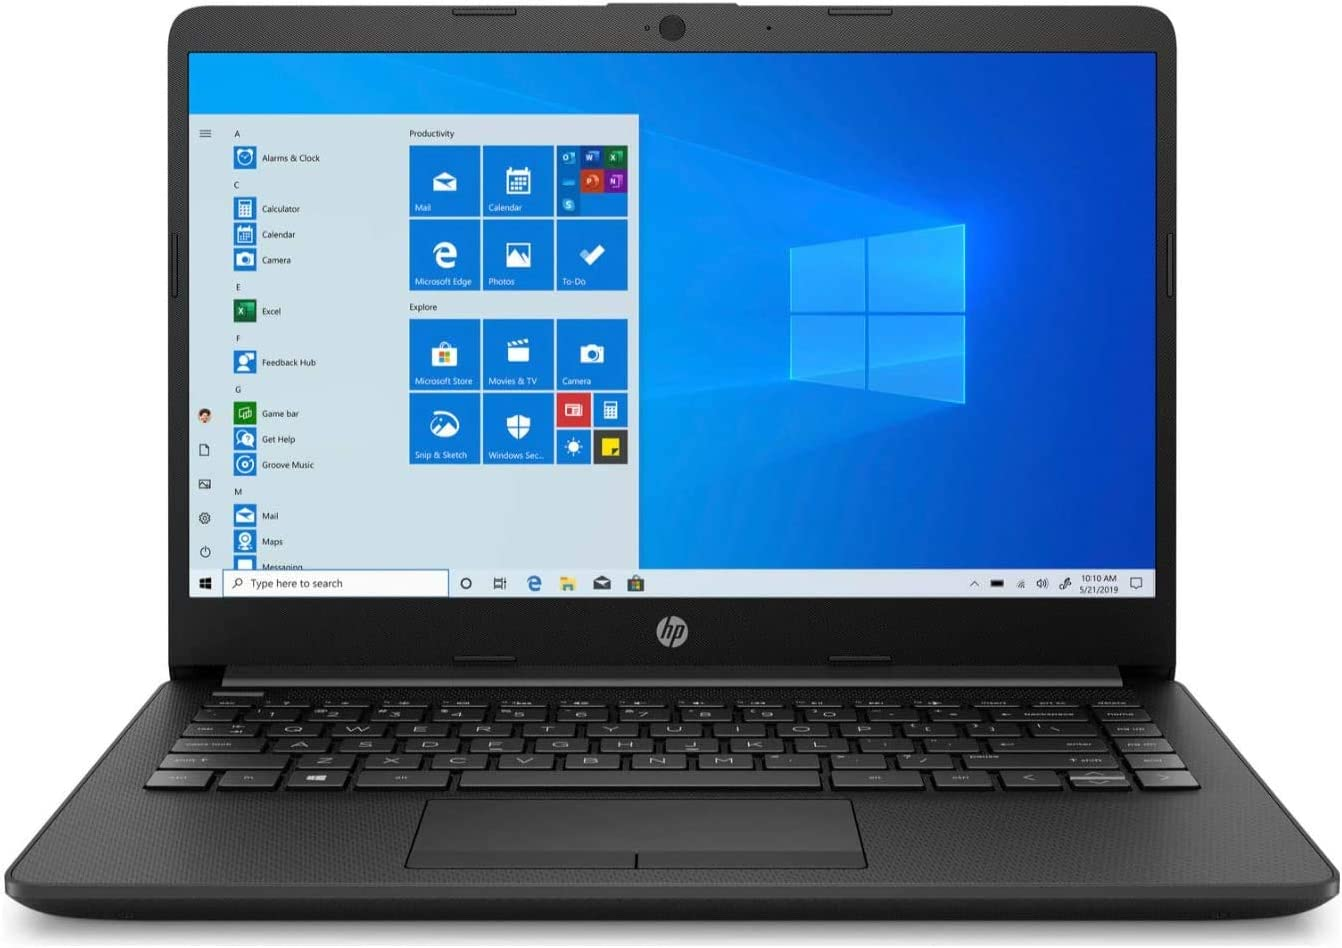 "Newest HP 14"" HD WLED Backlit High Performance Business Laptop, AMD Athlon Silver 3050U up to 3.2GHz, 4GB DDR4, 128GB SSD, Wireless-AC, HDMI, Bluetooth, Webcam, SD Card Reader, Windows 10 S (Renewed)"